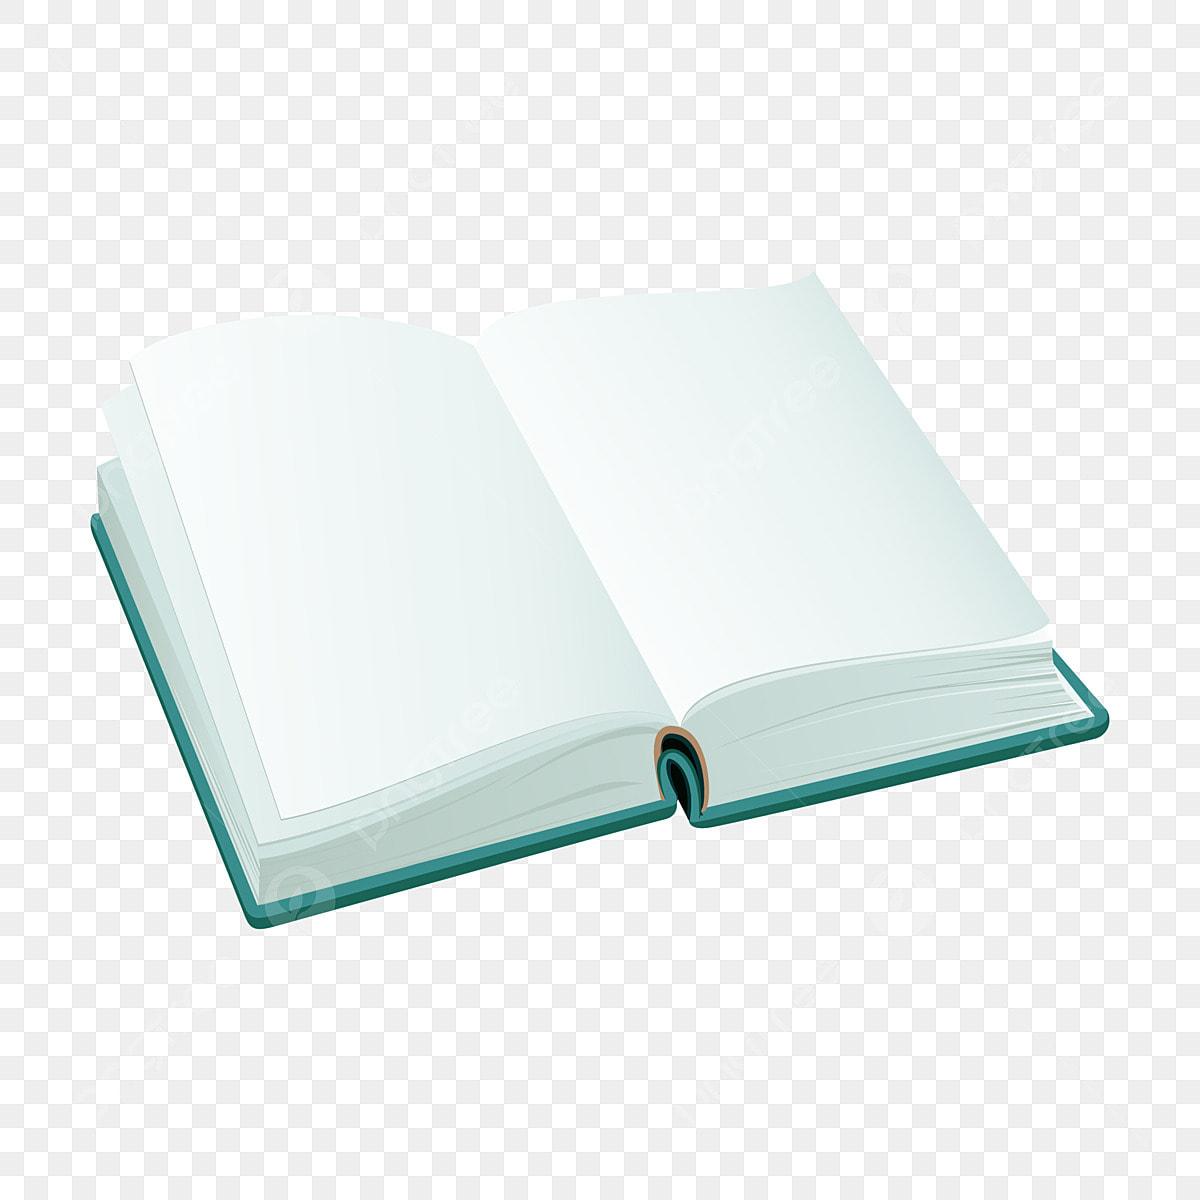 Livre Bleu Livre D Etude Beau Livre Livre Ouvert Livre